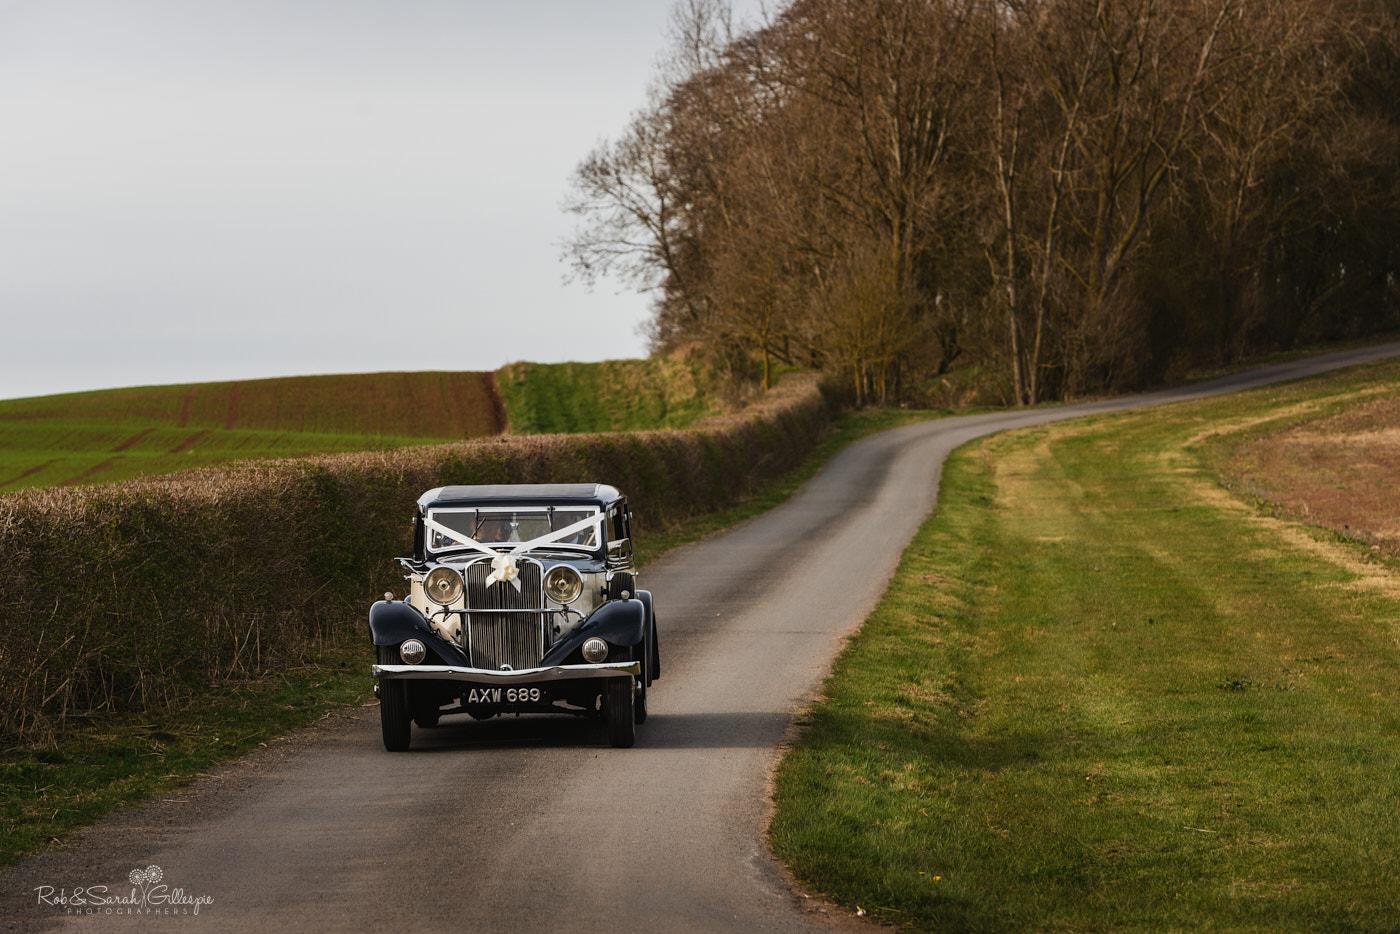 Wedding car arrives at Swallows Nest Barn